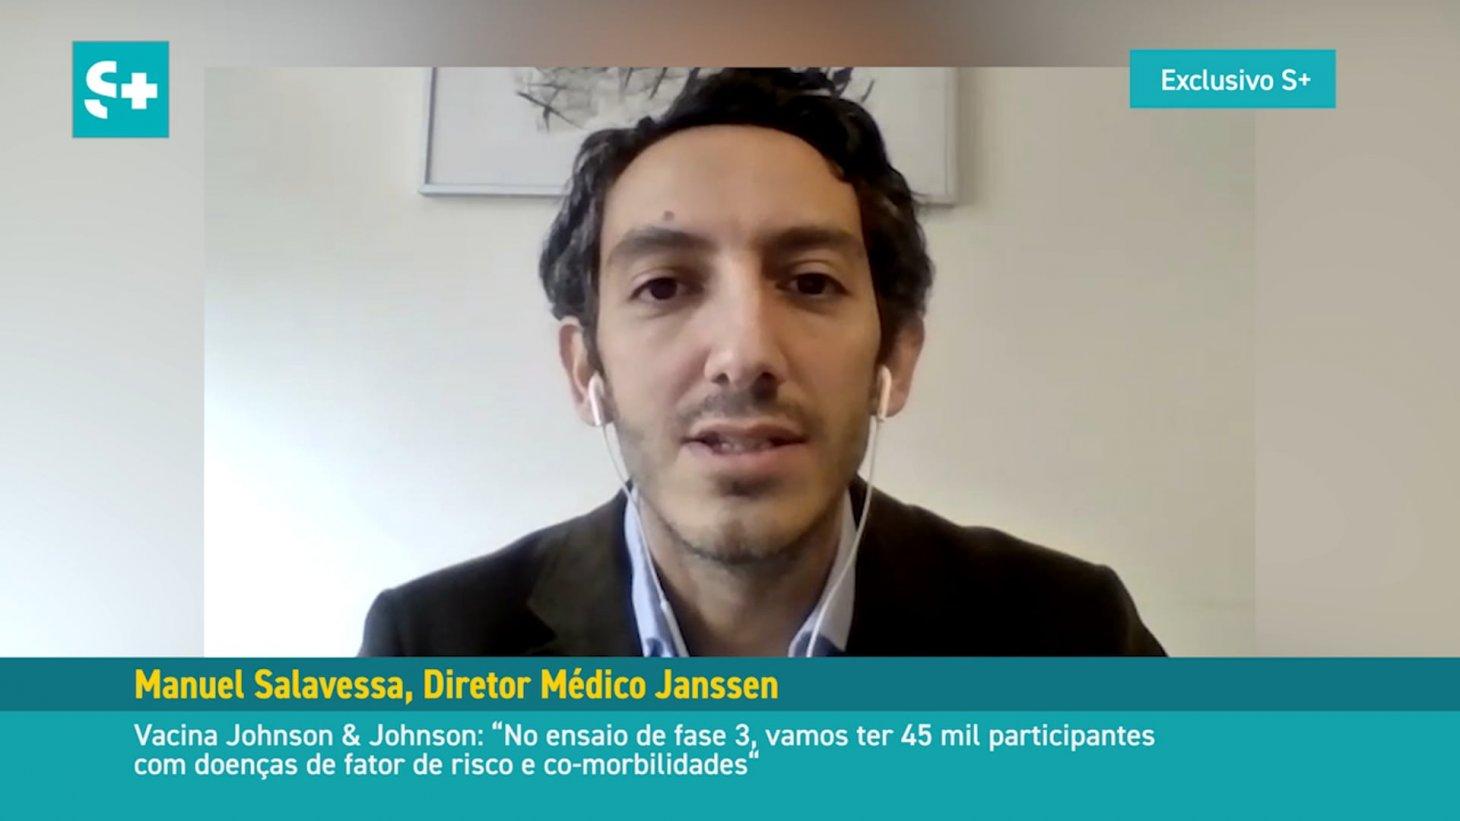 Manuel Salavessa, Diretor Médico da Janssen #04